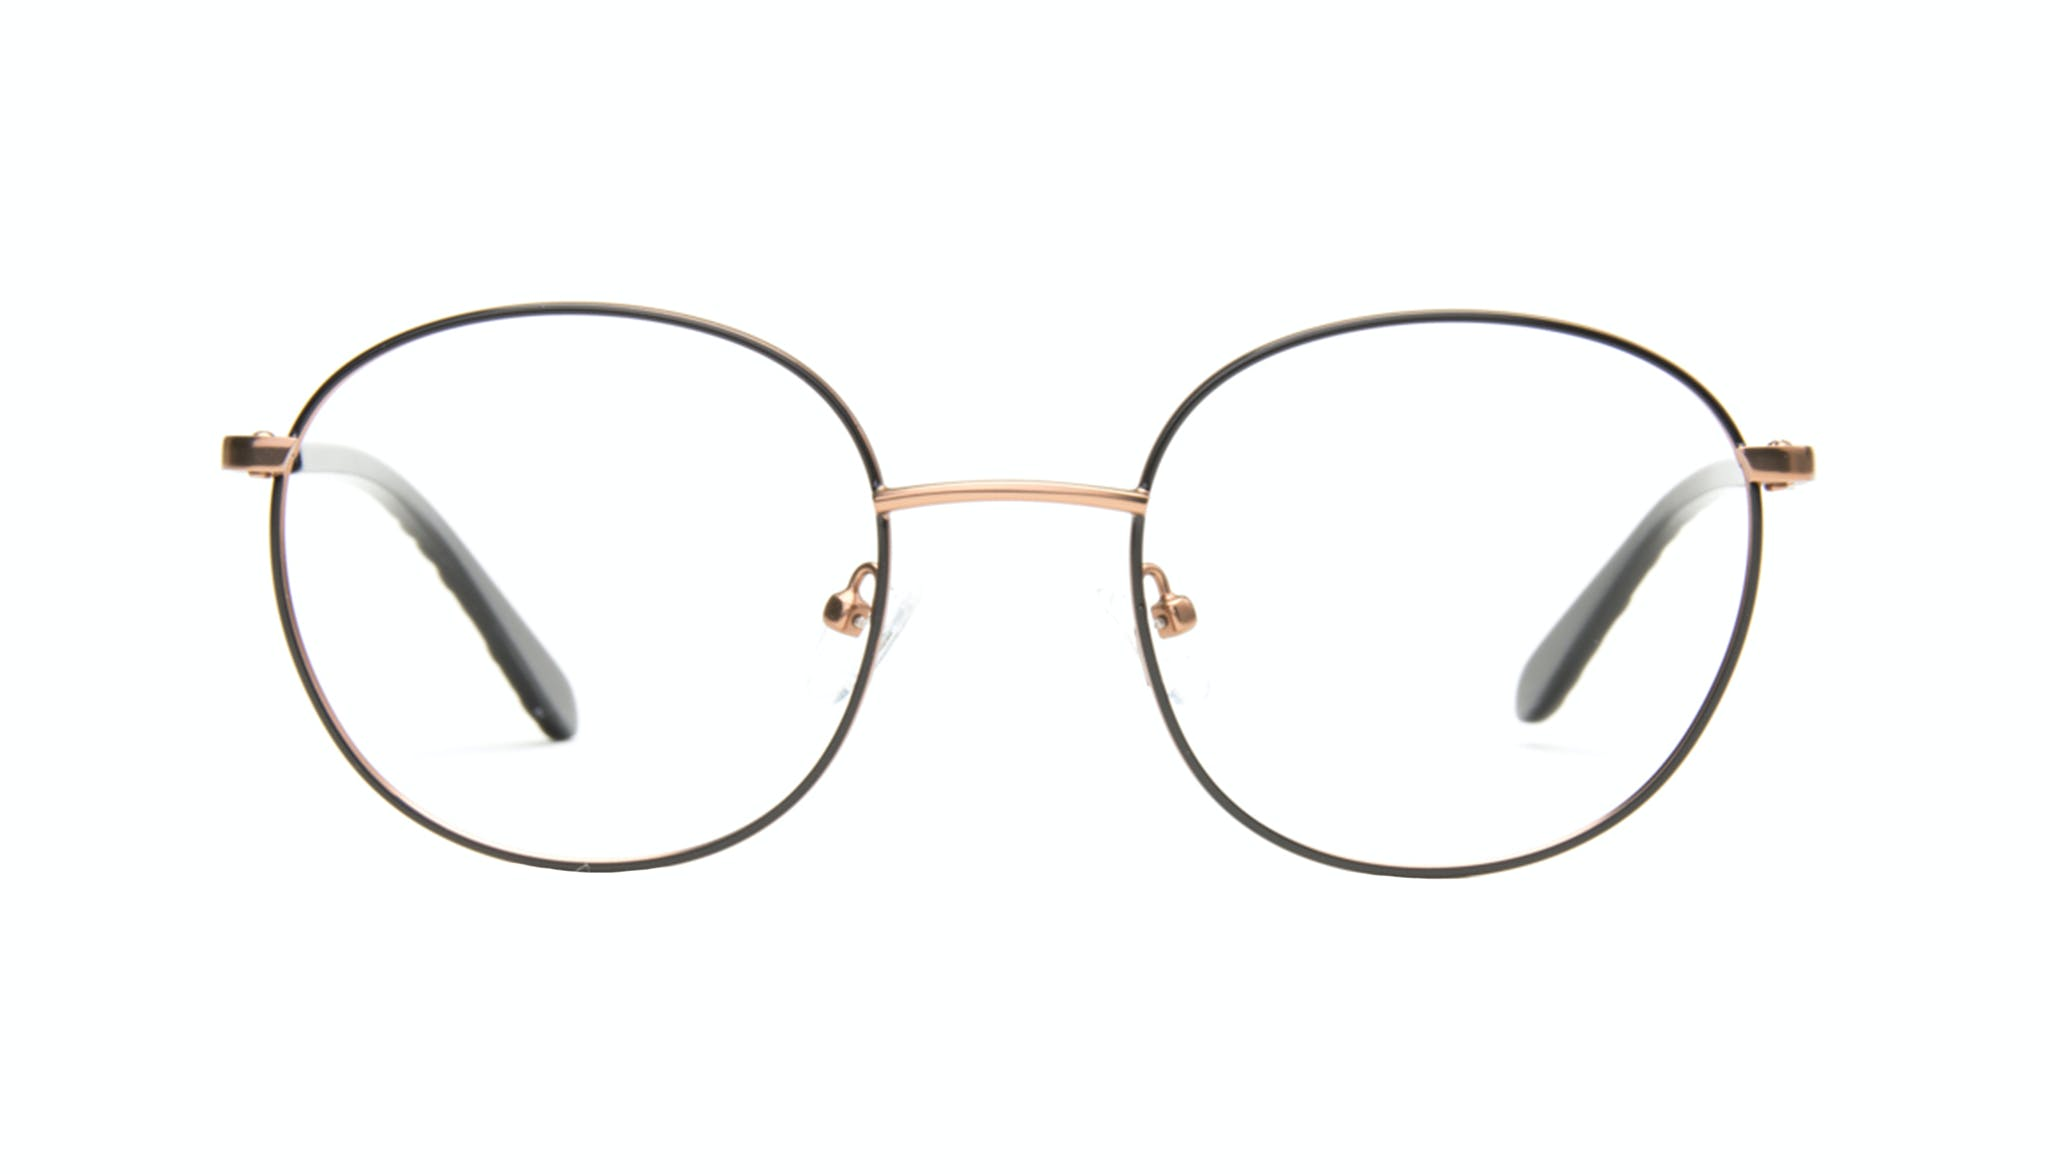 Affordable Fashion Glasses Round Eyeglasses Women Joy Black Copper Front